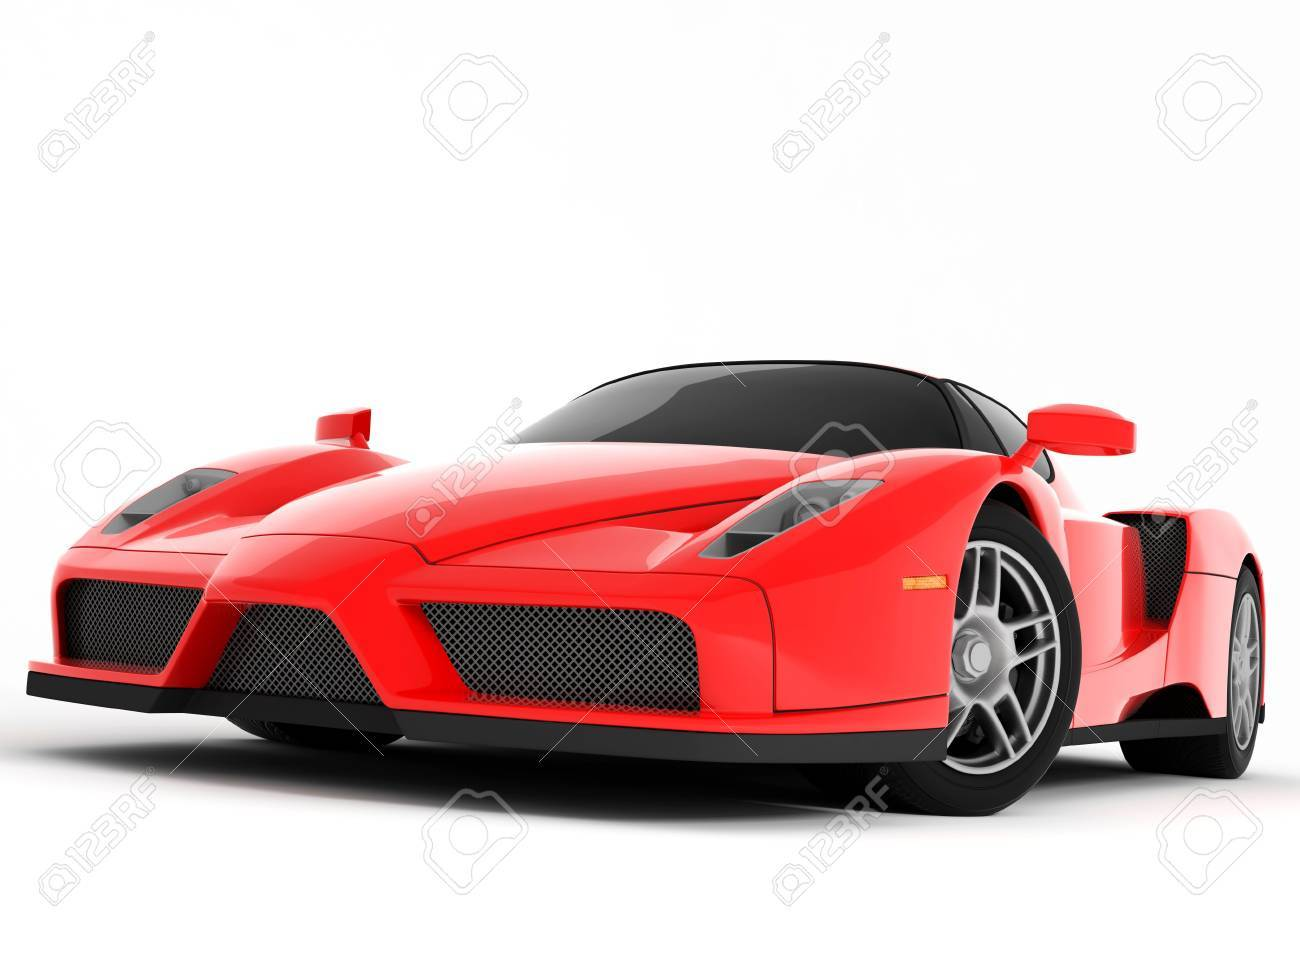 Red Super Car Stock Photo - 6014283